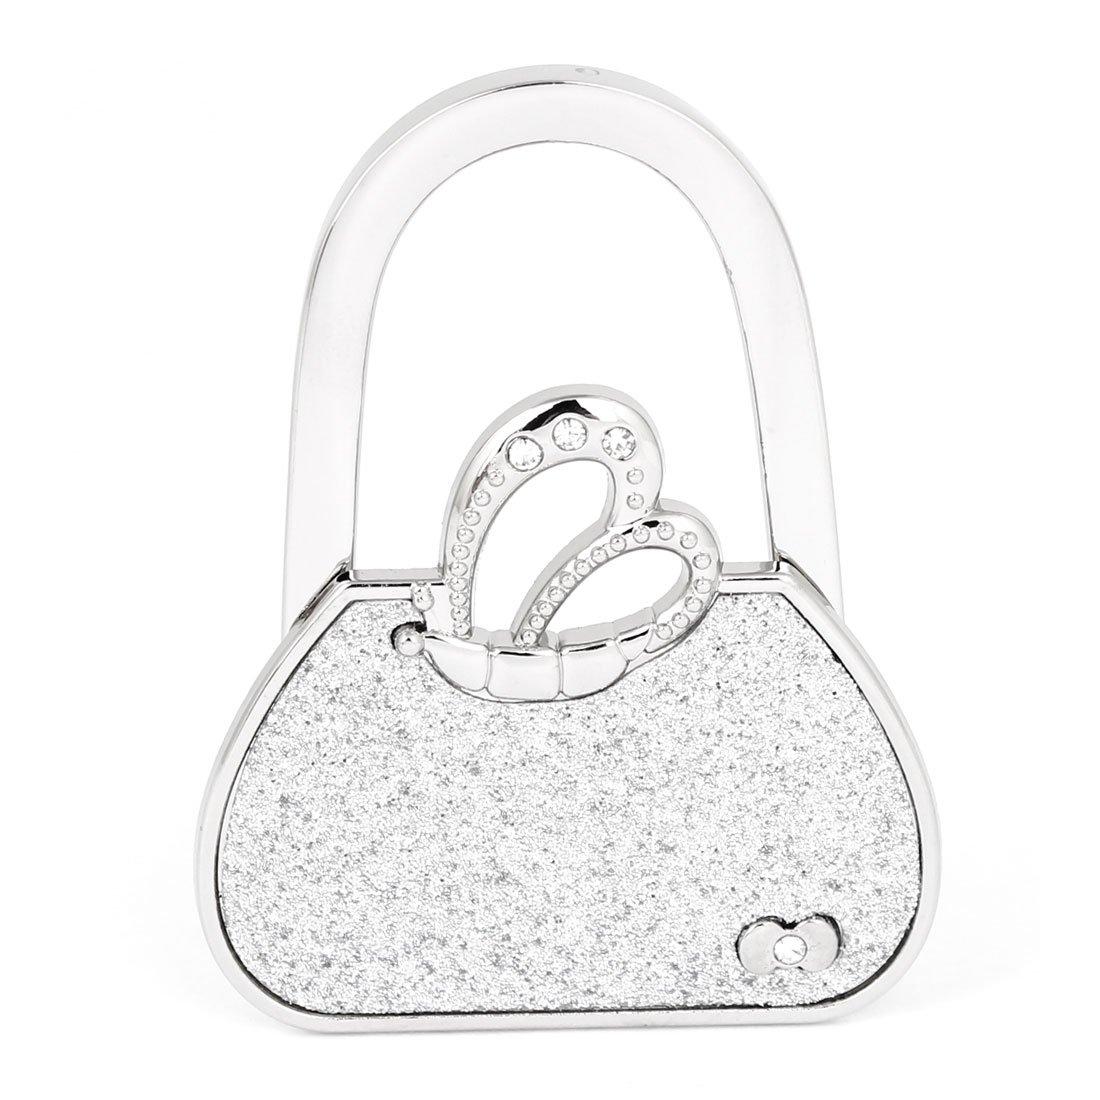 Gsfy-Бабочка Акцент складной стол крюк кошелек вешалка держатель для Для женщин